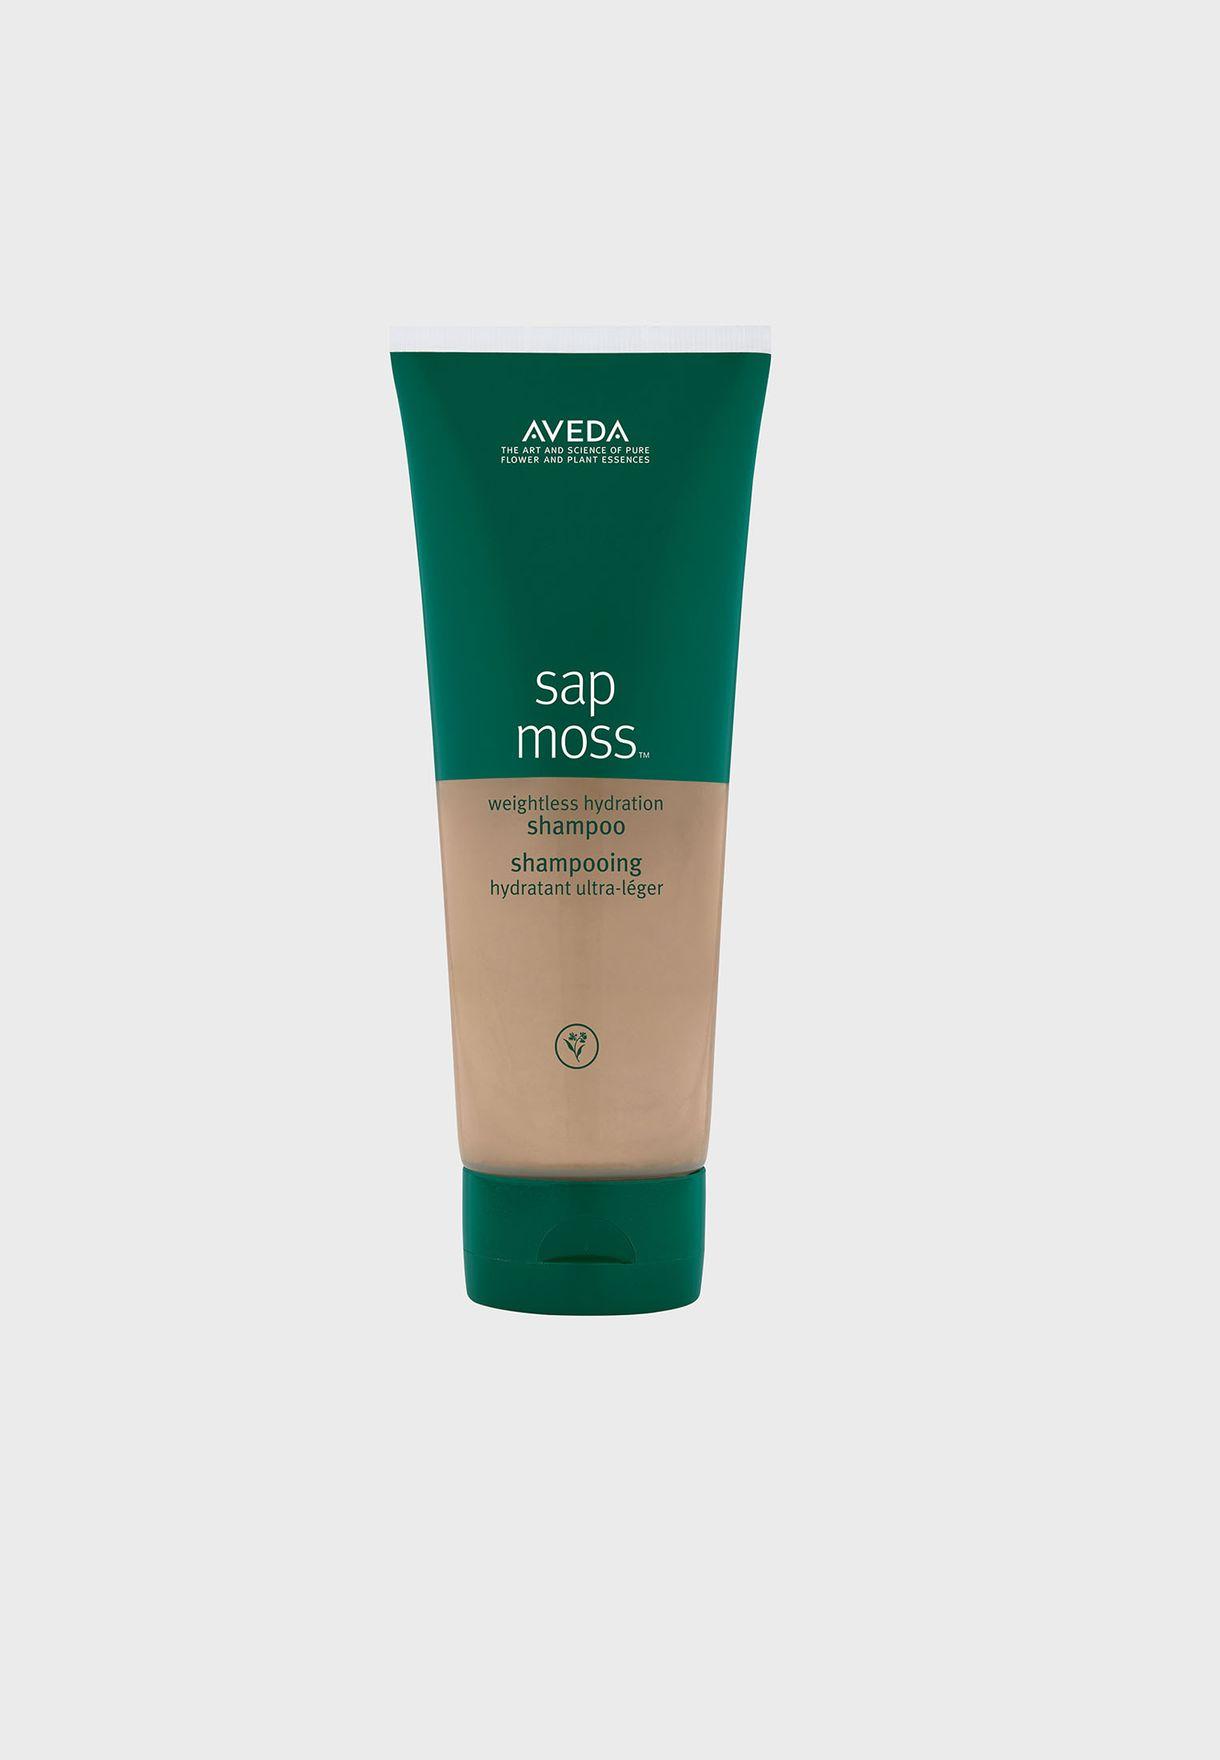 Sap Moss Weightless Hydration Shampoo 200ml